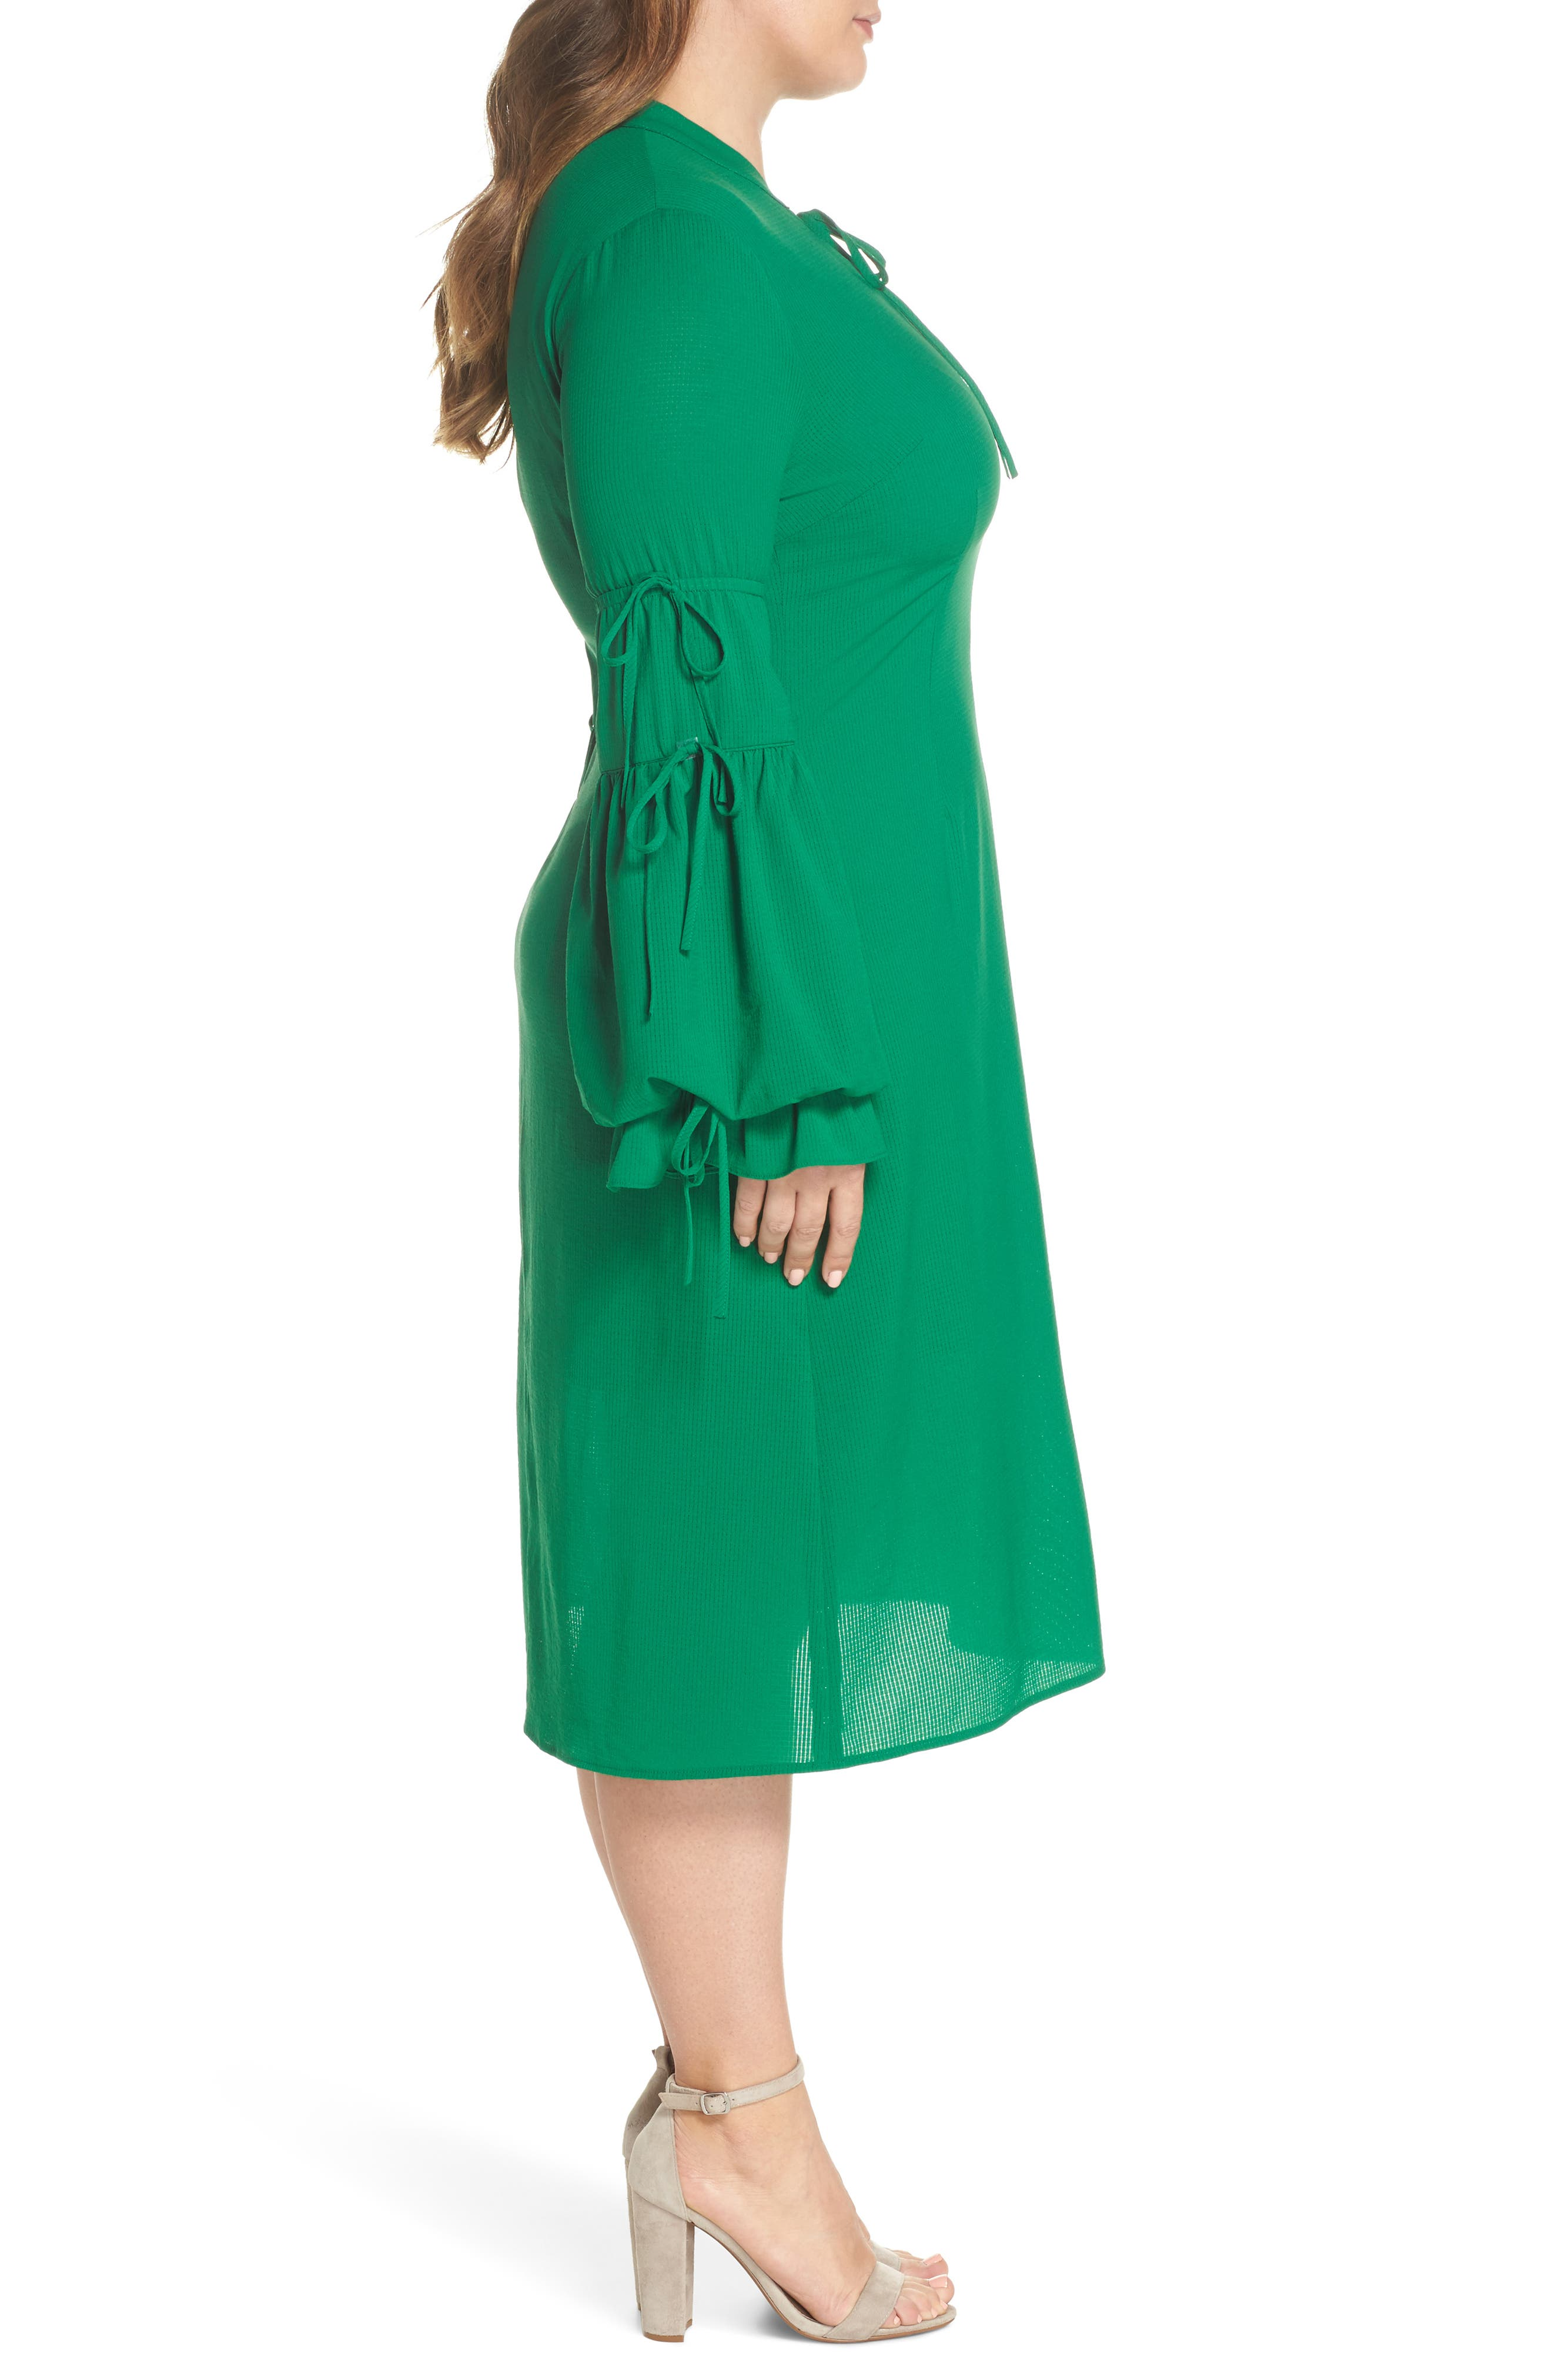 Leiko Antoinette Puff Sleeve Tea Dress,                             Alternate thumbnail 3, color,                             300